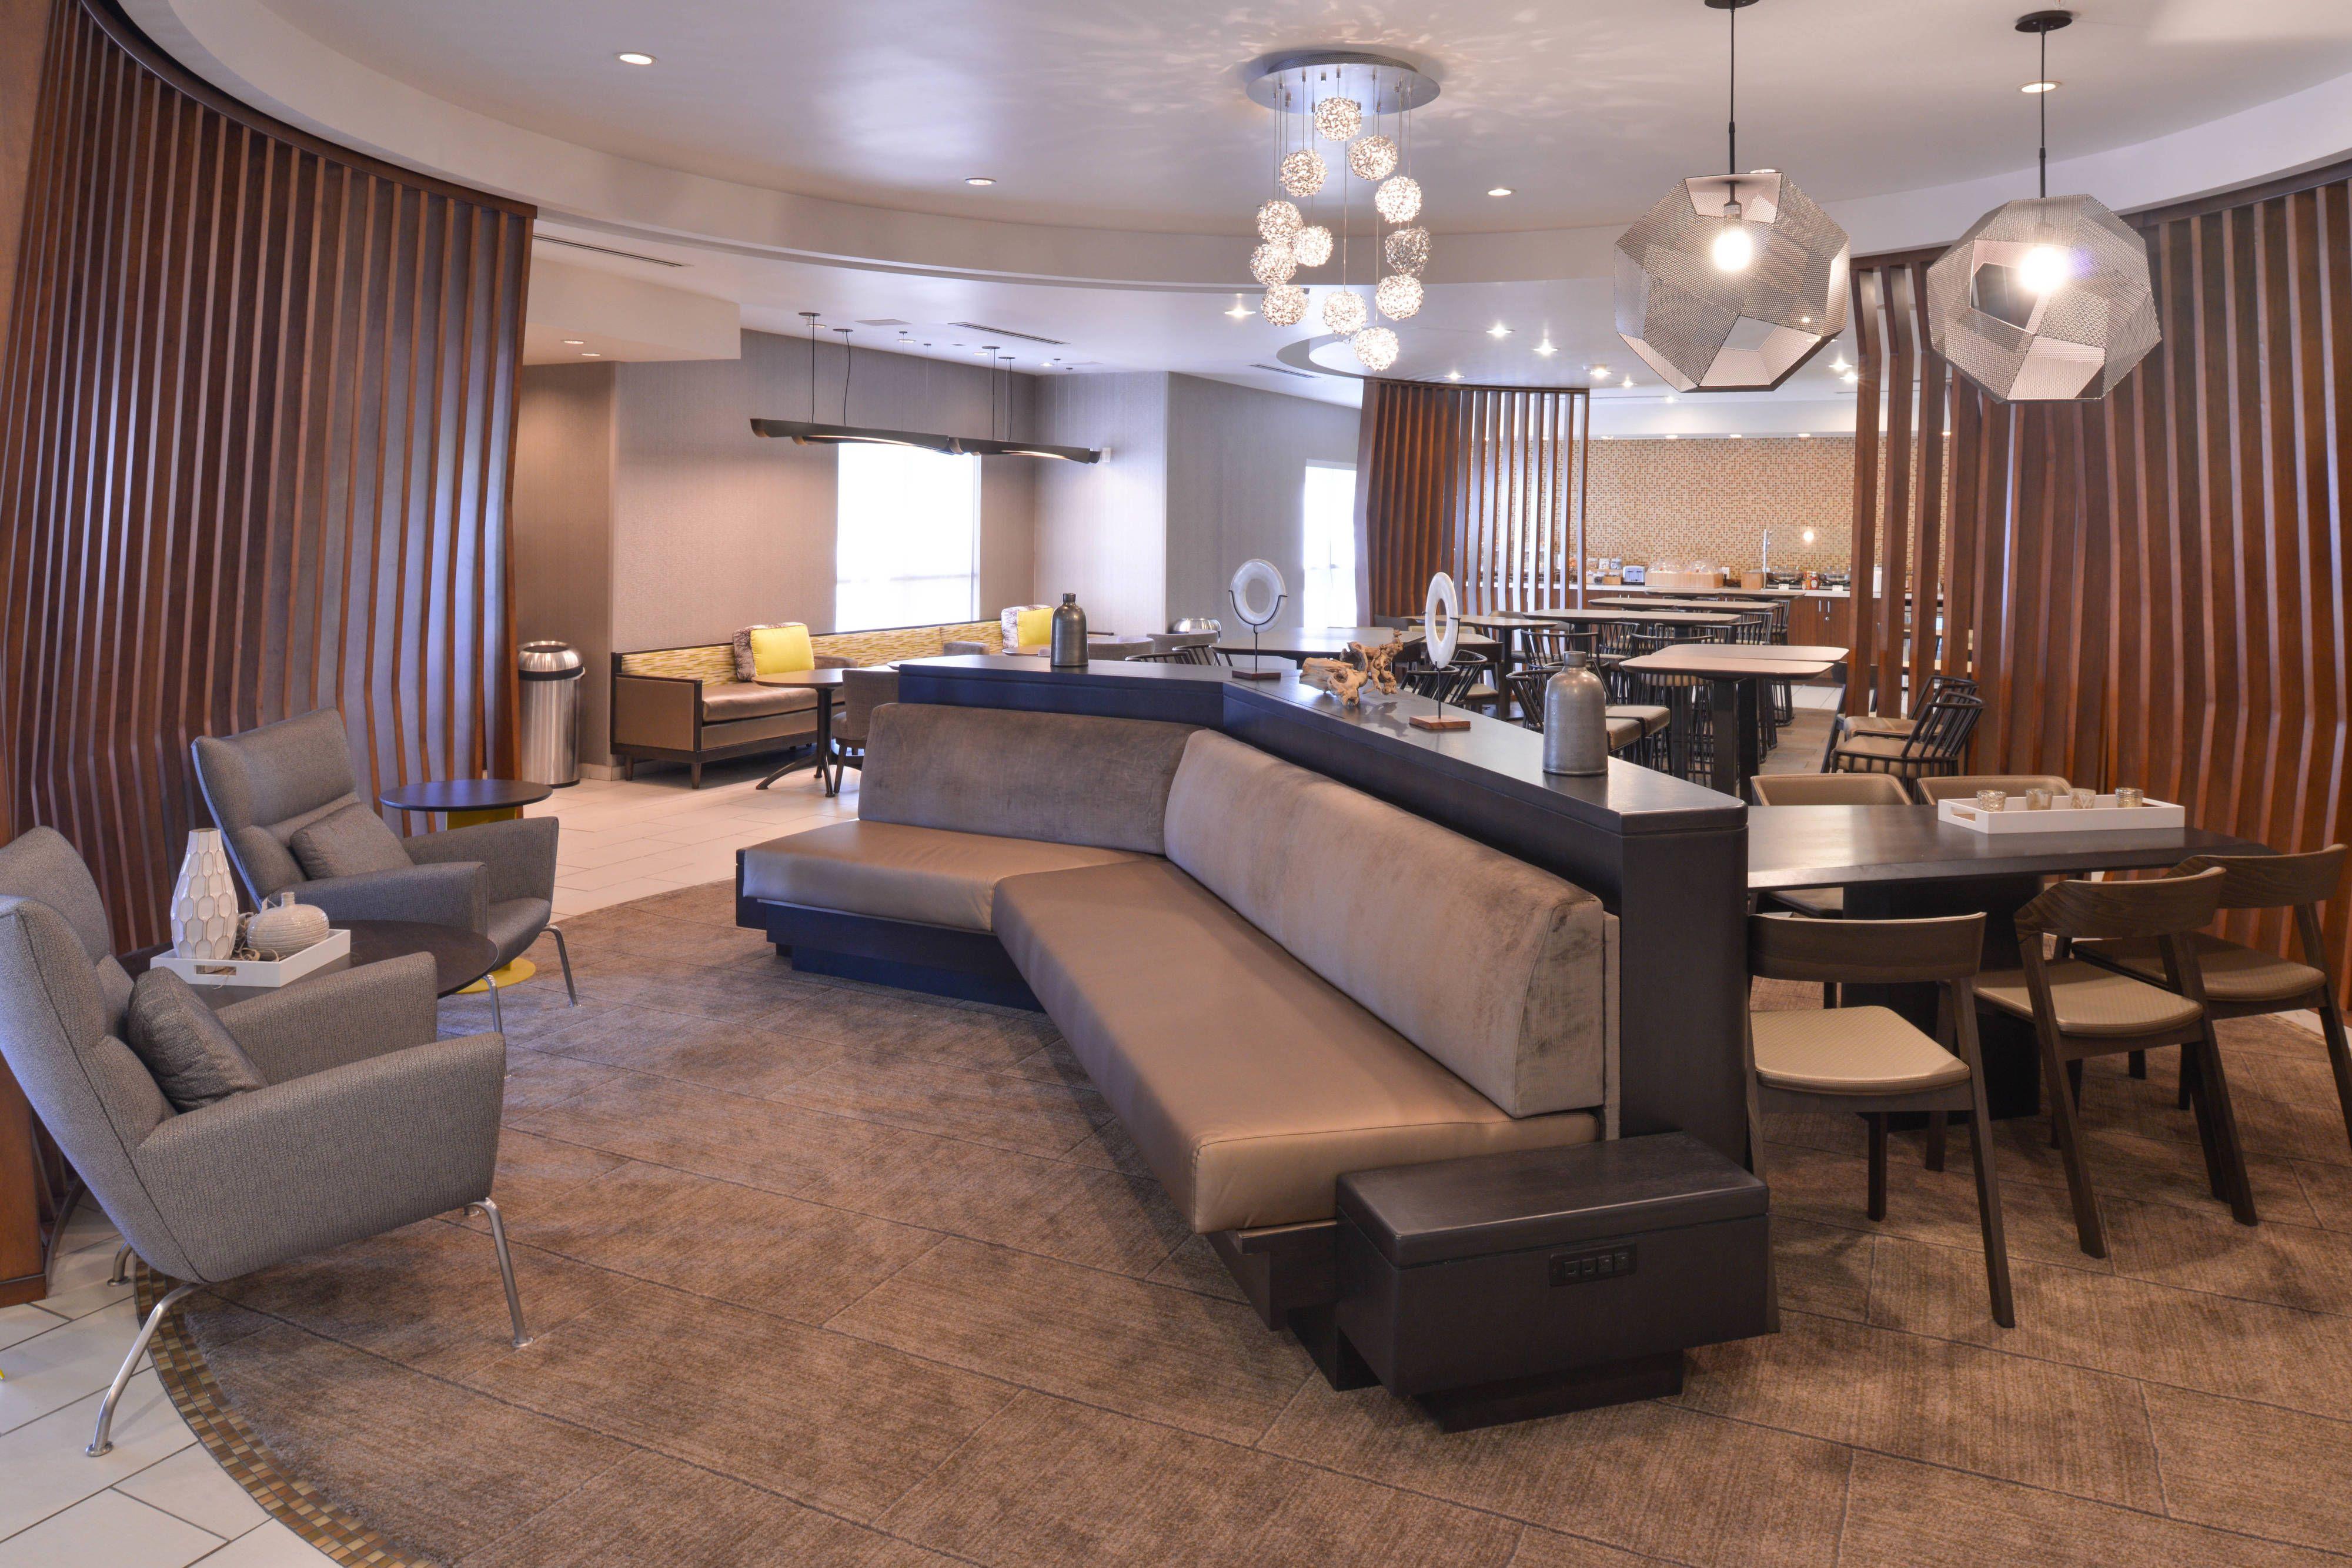 SpringHill Suites Las Vegas Henderson Lobby holiday,